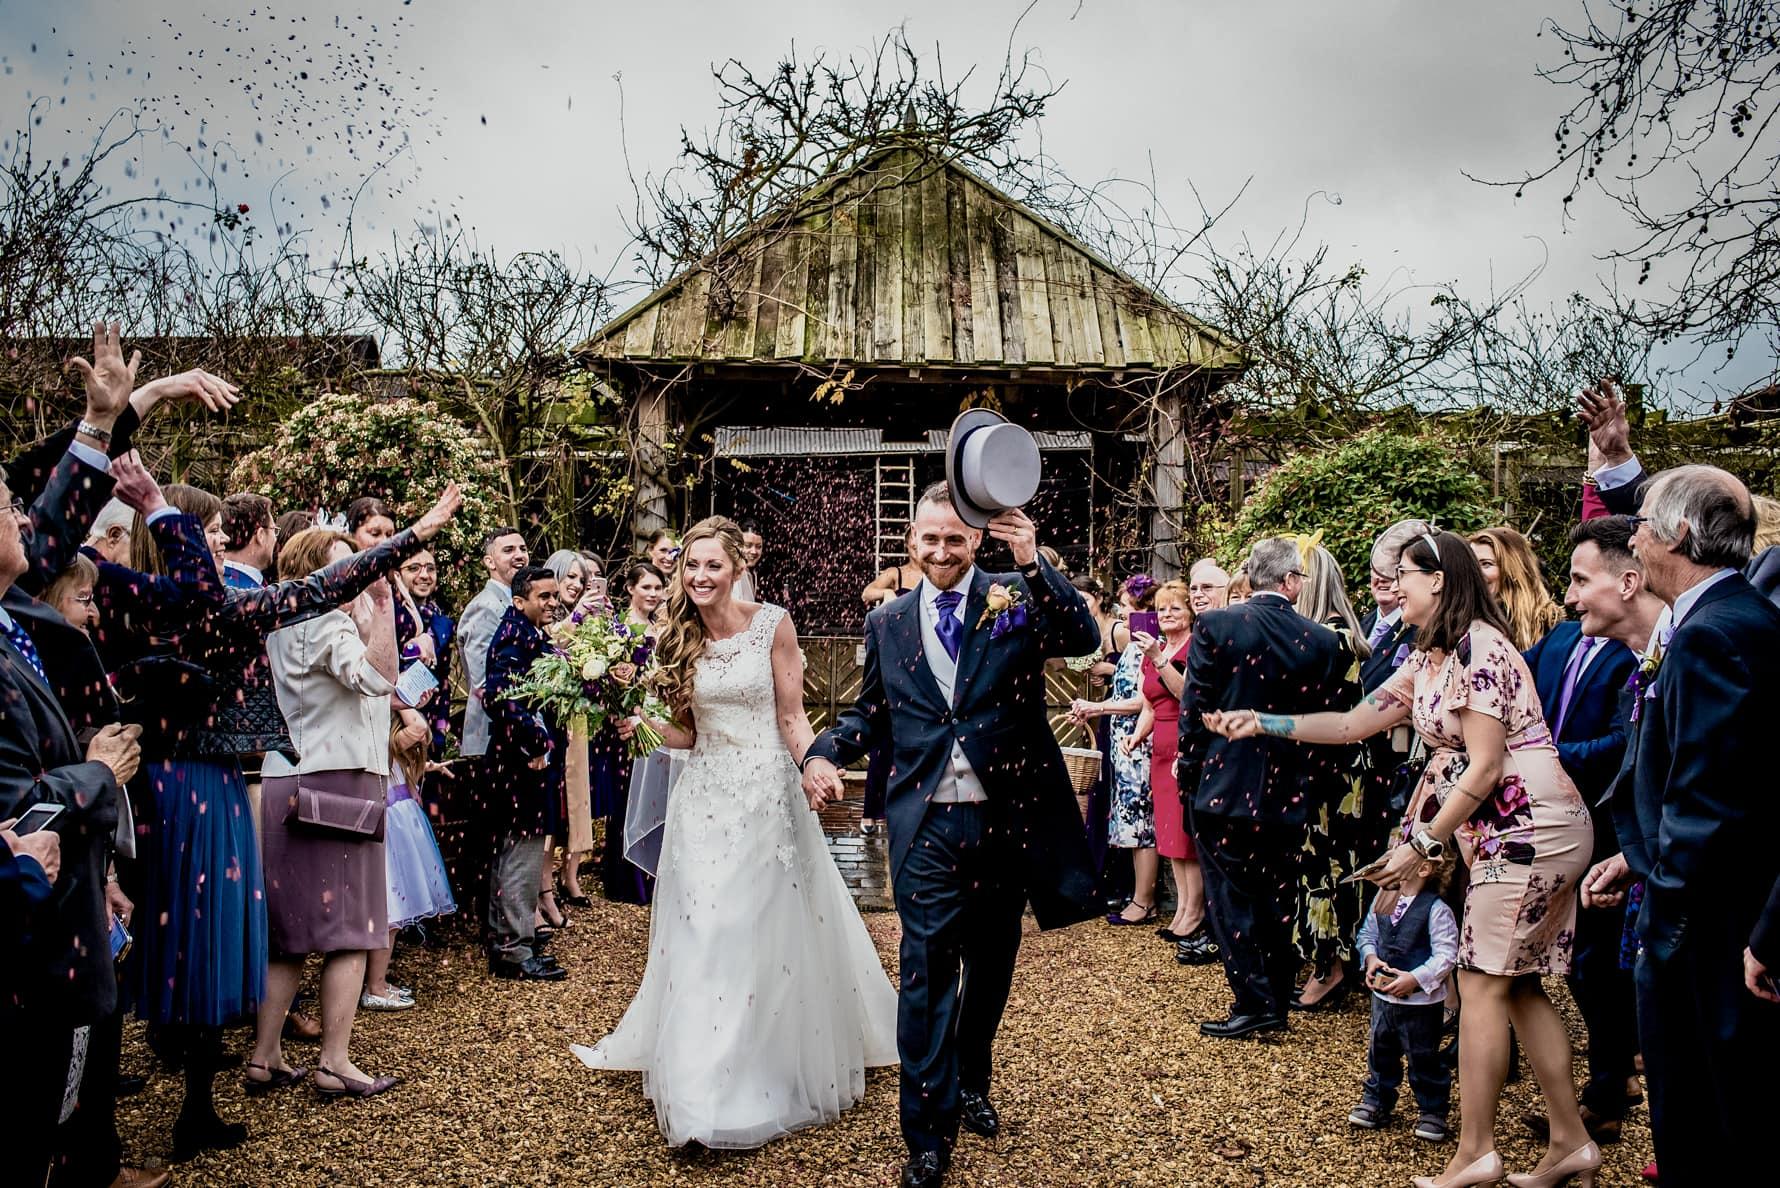 Winter wedding at South Farm in Cambridge